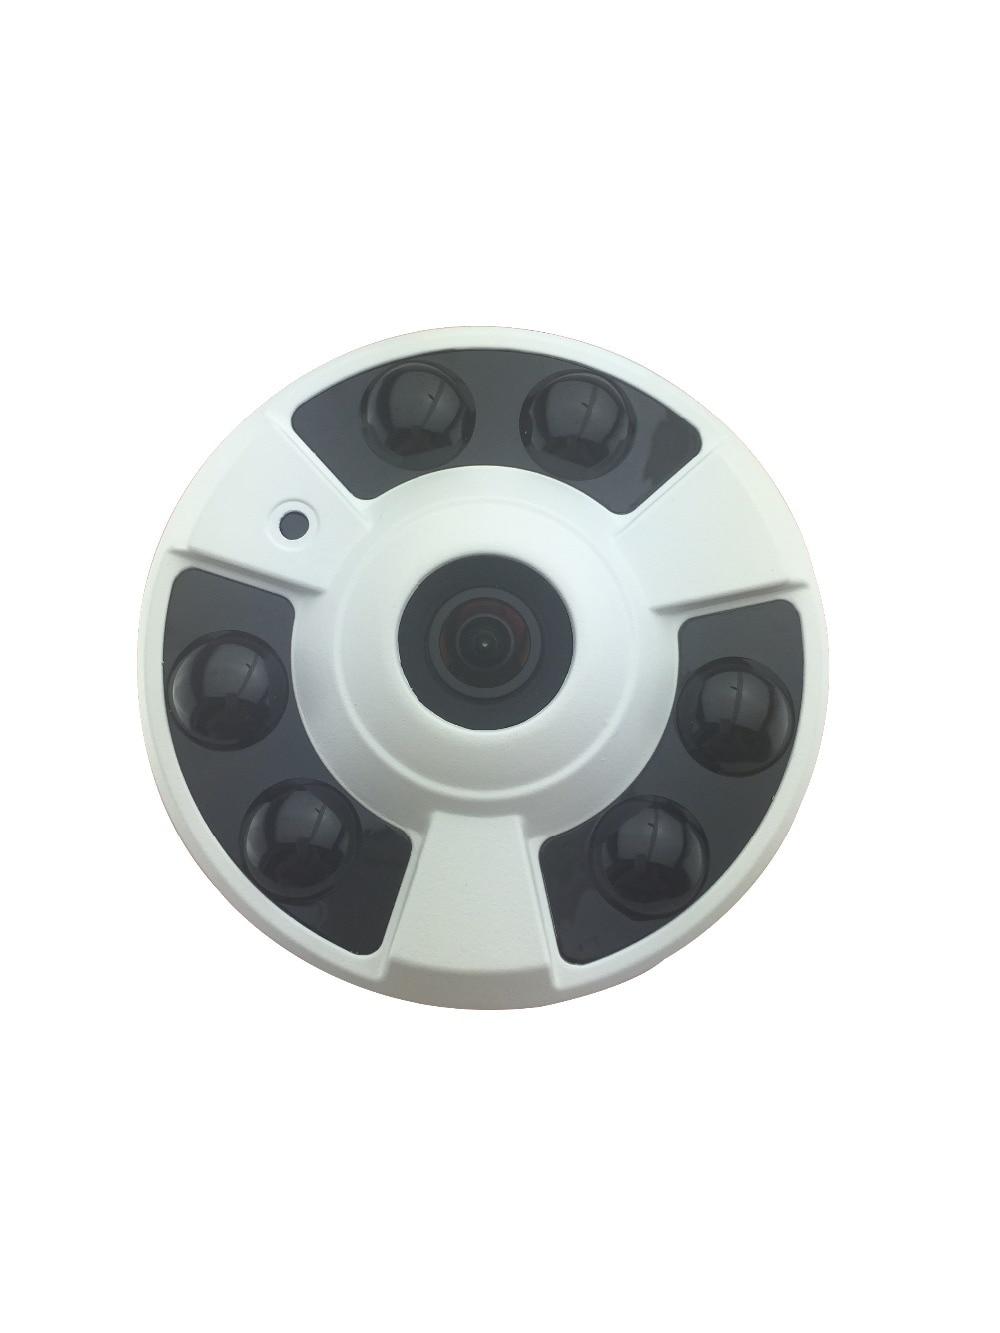 POE Audio Fisheye 180 Degree POE IP Camera HD 1080P 2MP Indoor Network P2P IR font